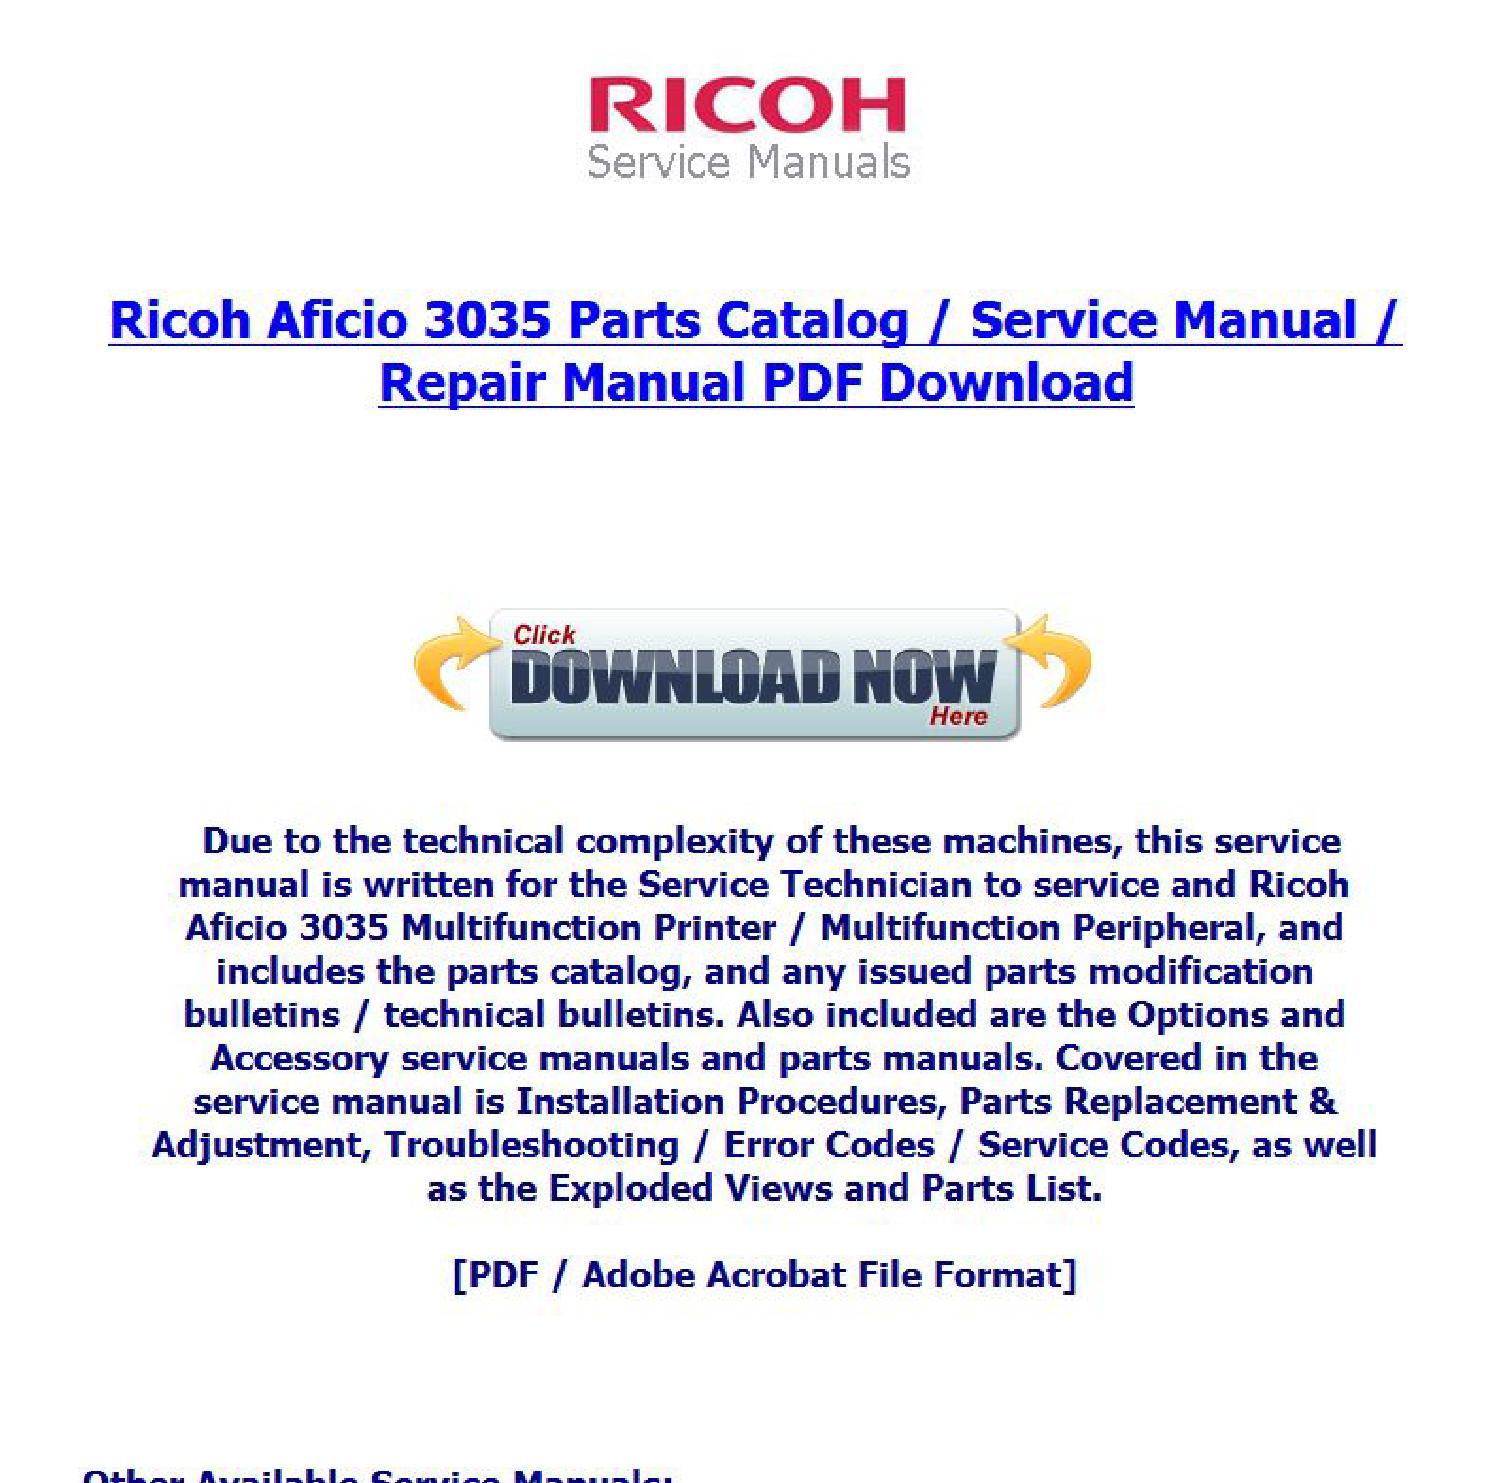 Ricoh Aficio 3035 Parts Catalog Repair Service Manual Download By Sony Vaio Diagram Tsg The Guys Issuu